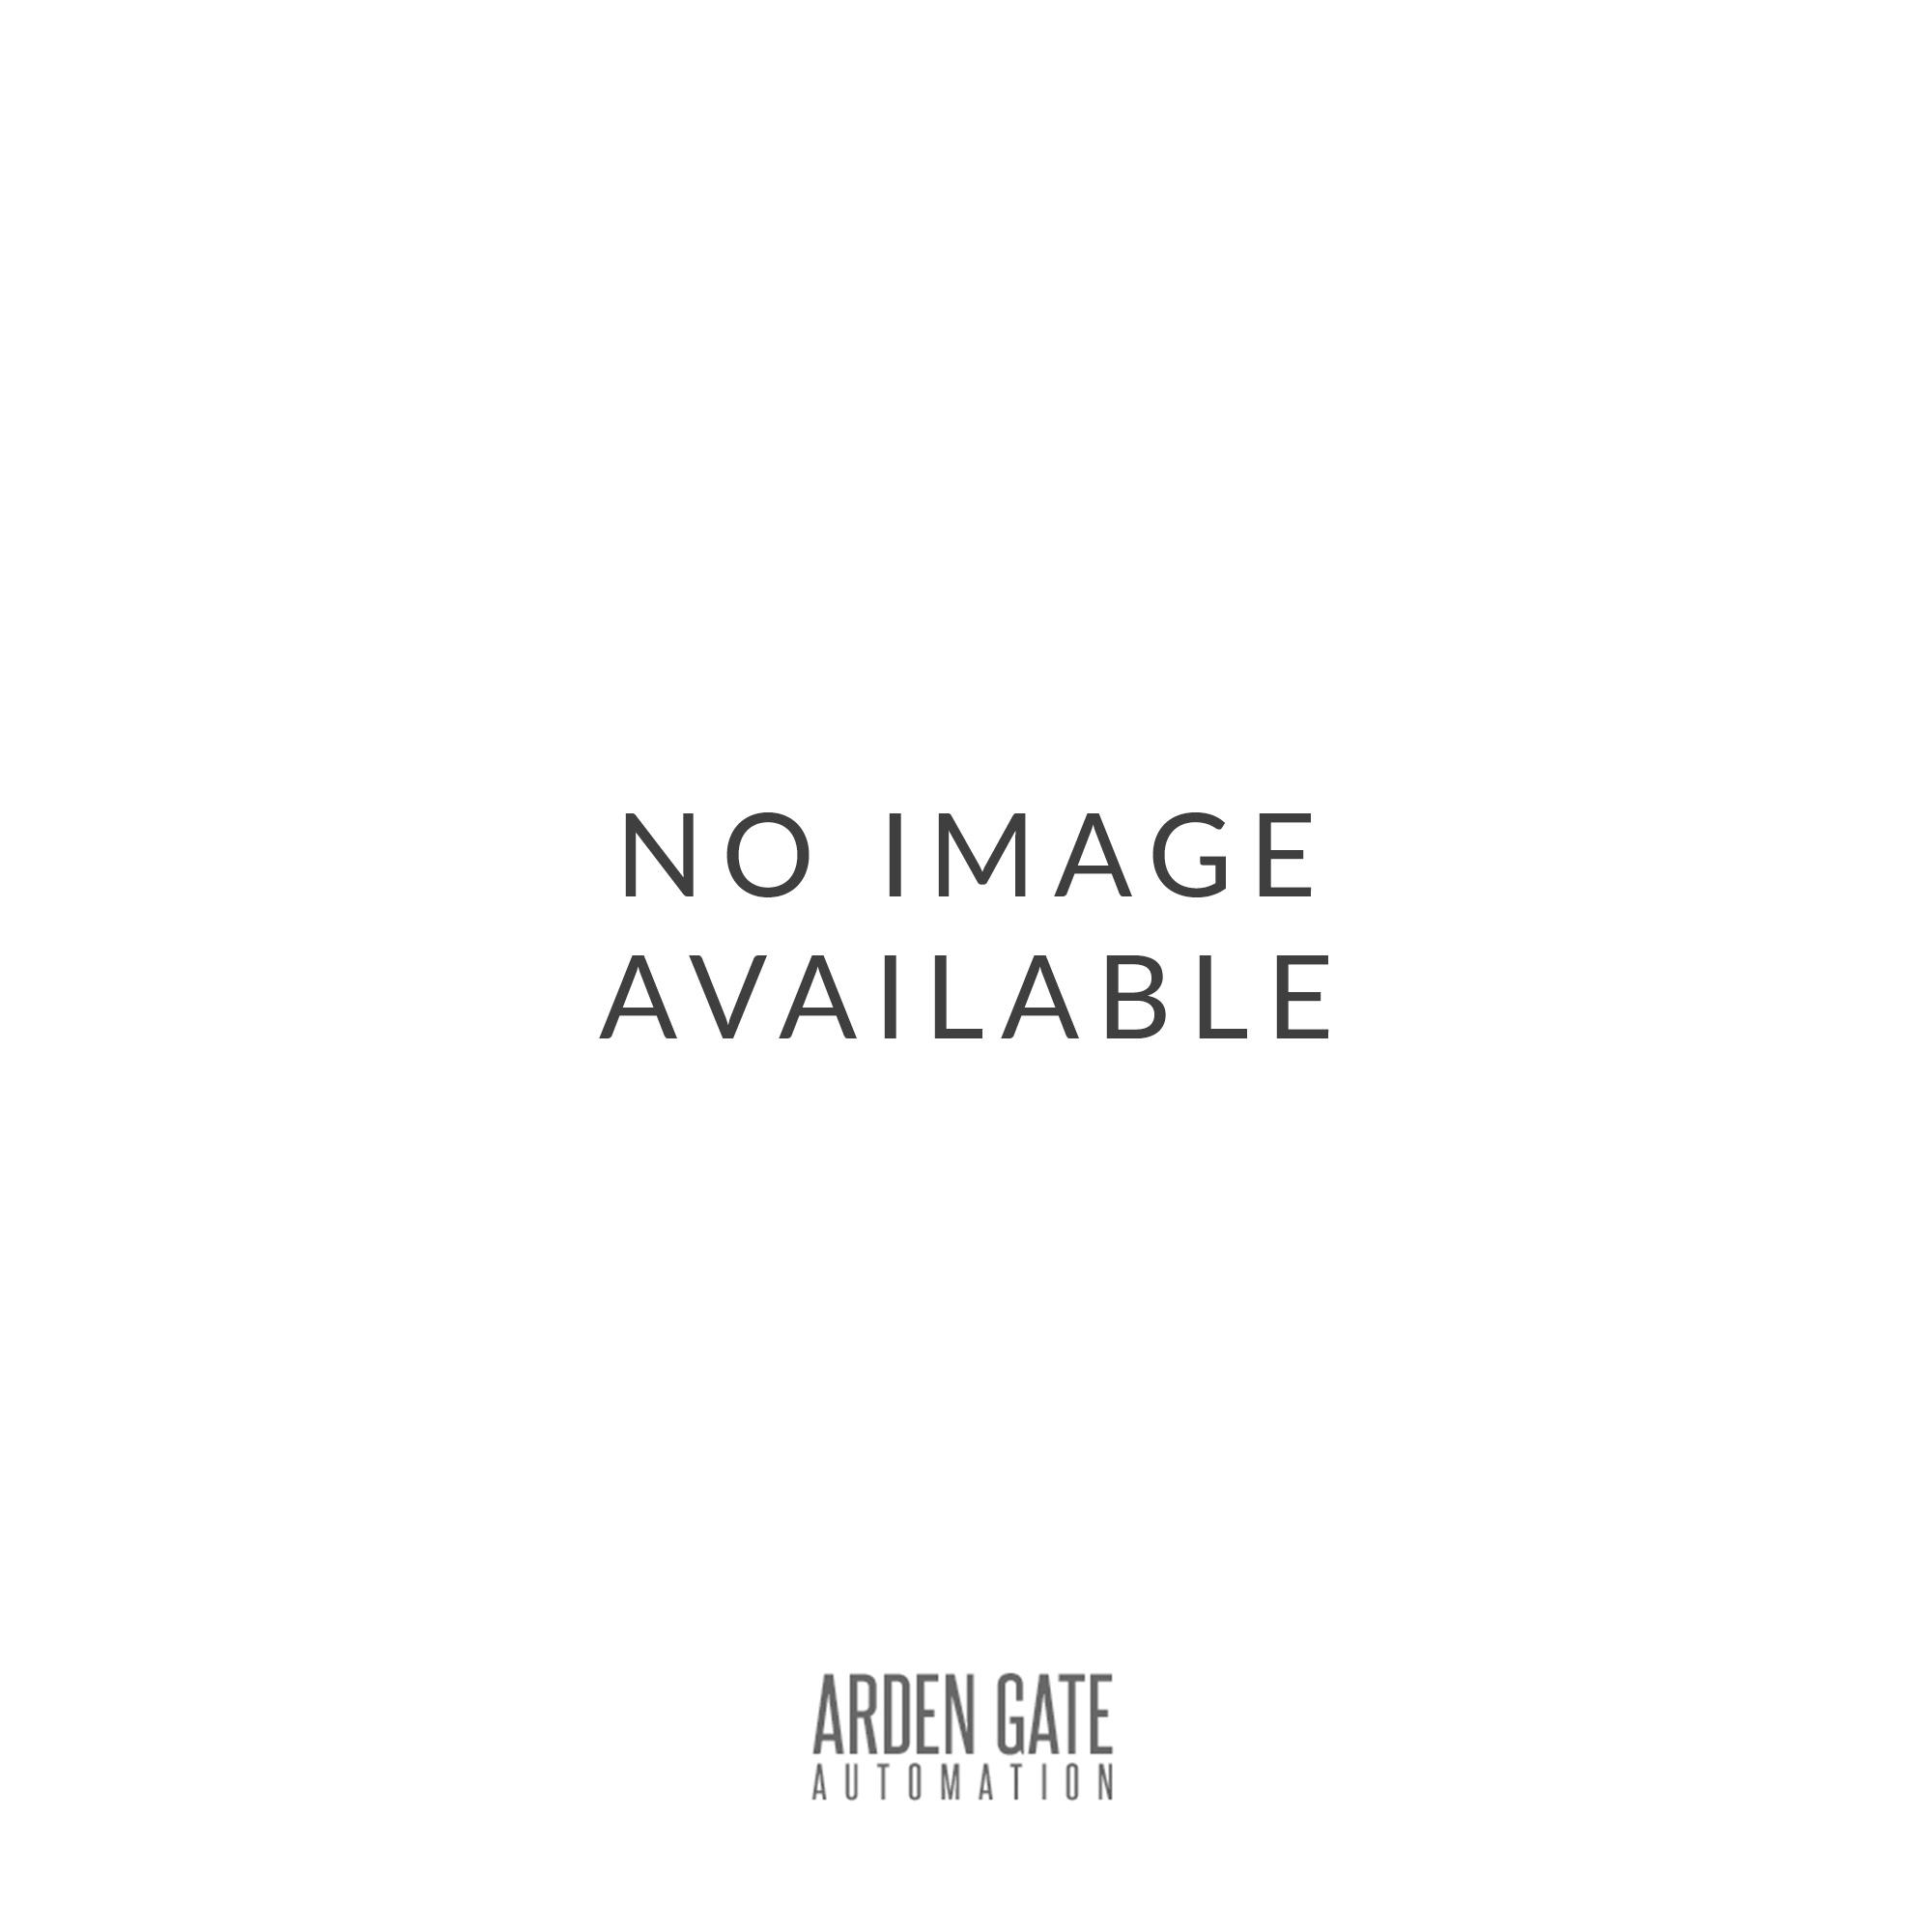 "CDVI 7"" TFT Colour LCD Monitor, Touch Sensitive, Black"